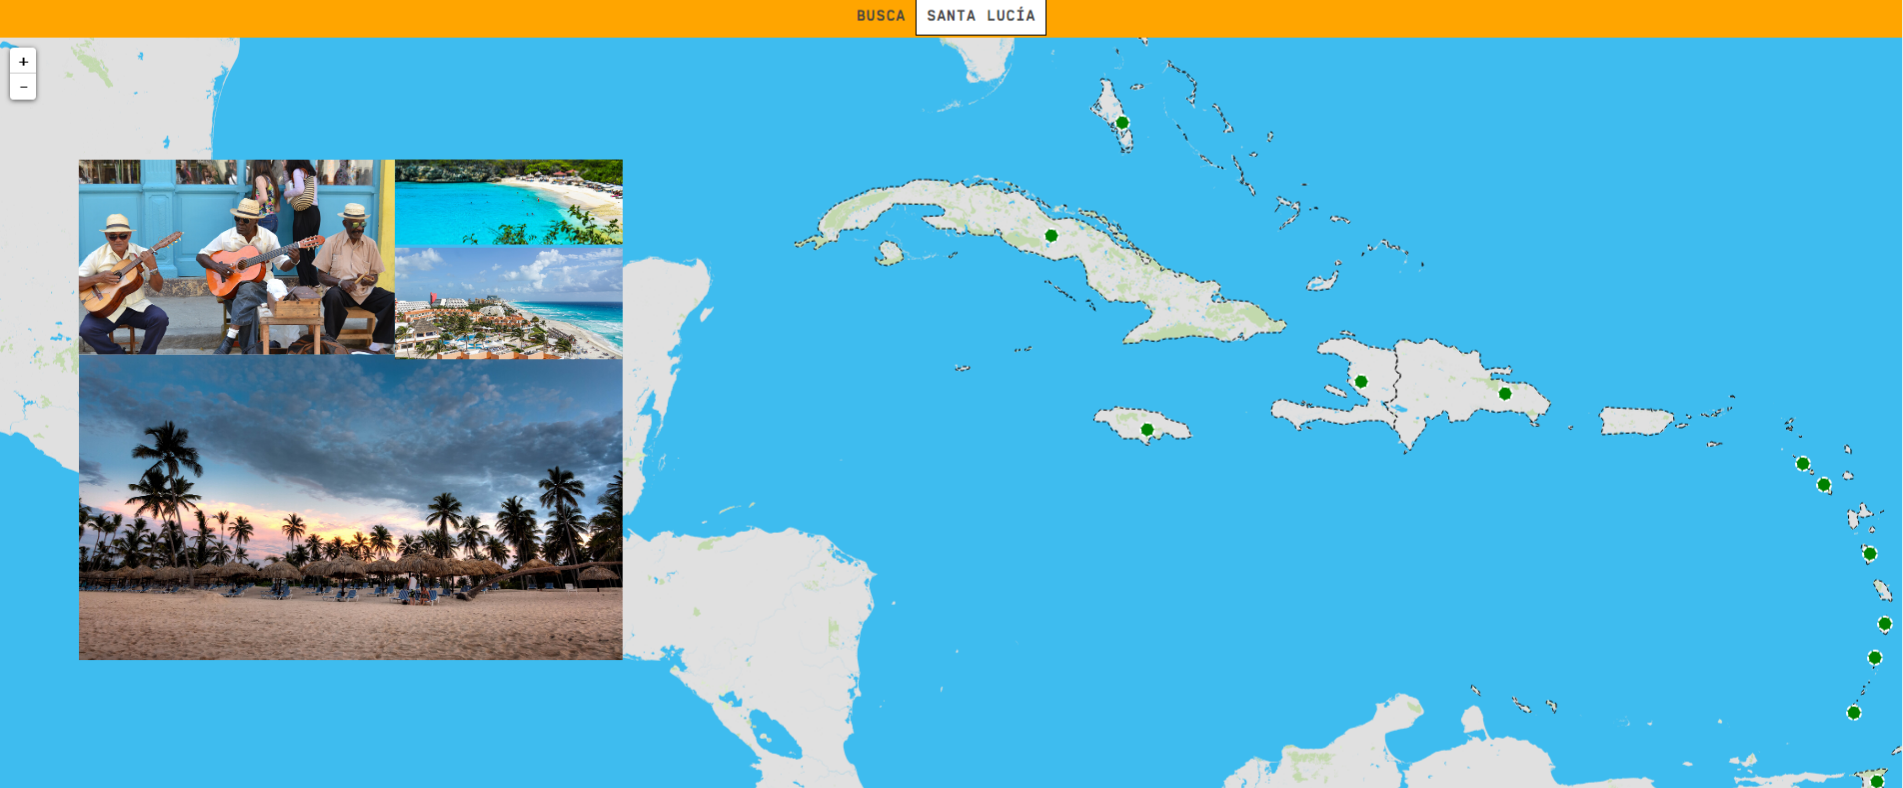 O Caribe: países